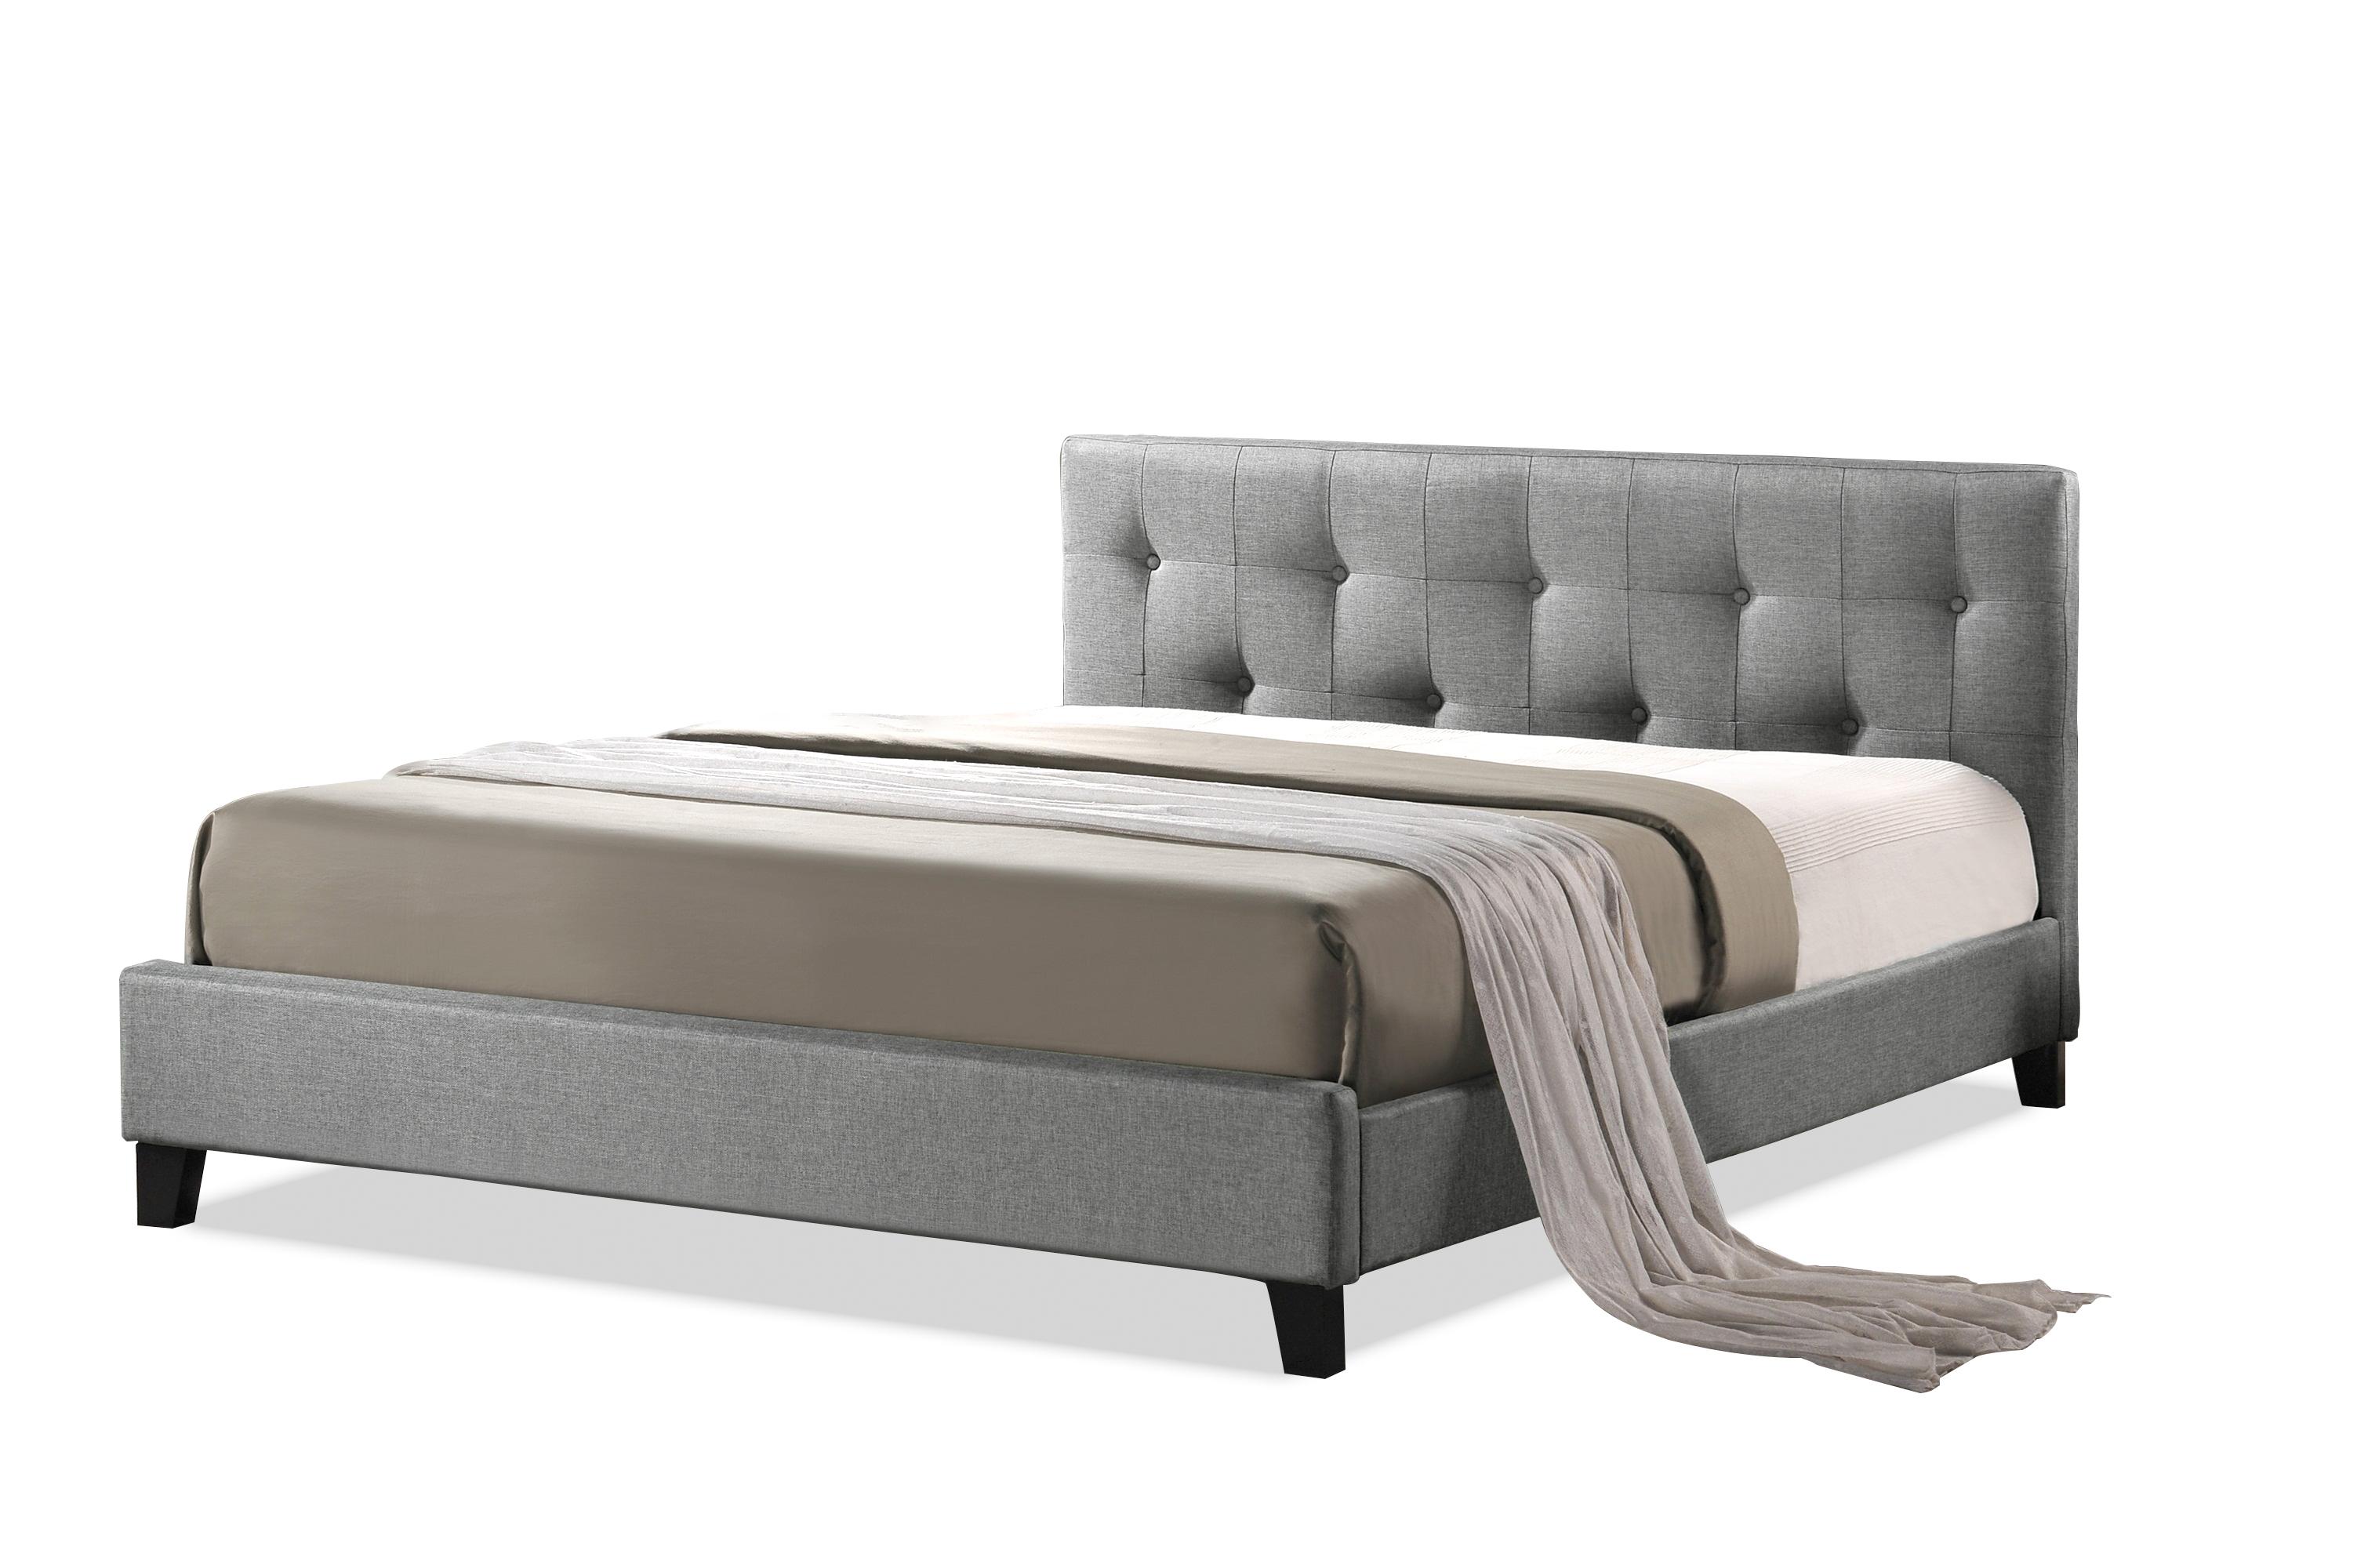 Beautiful Baxton Studio Annette Gray Linen Modern Bed With Upholstered Headboard Full  Size Annette Gray Linen.